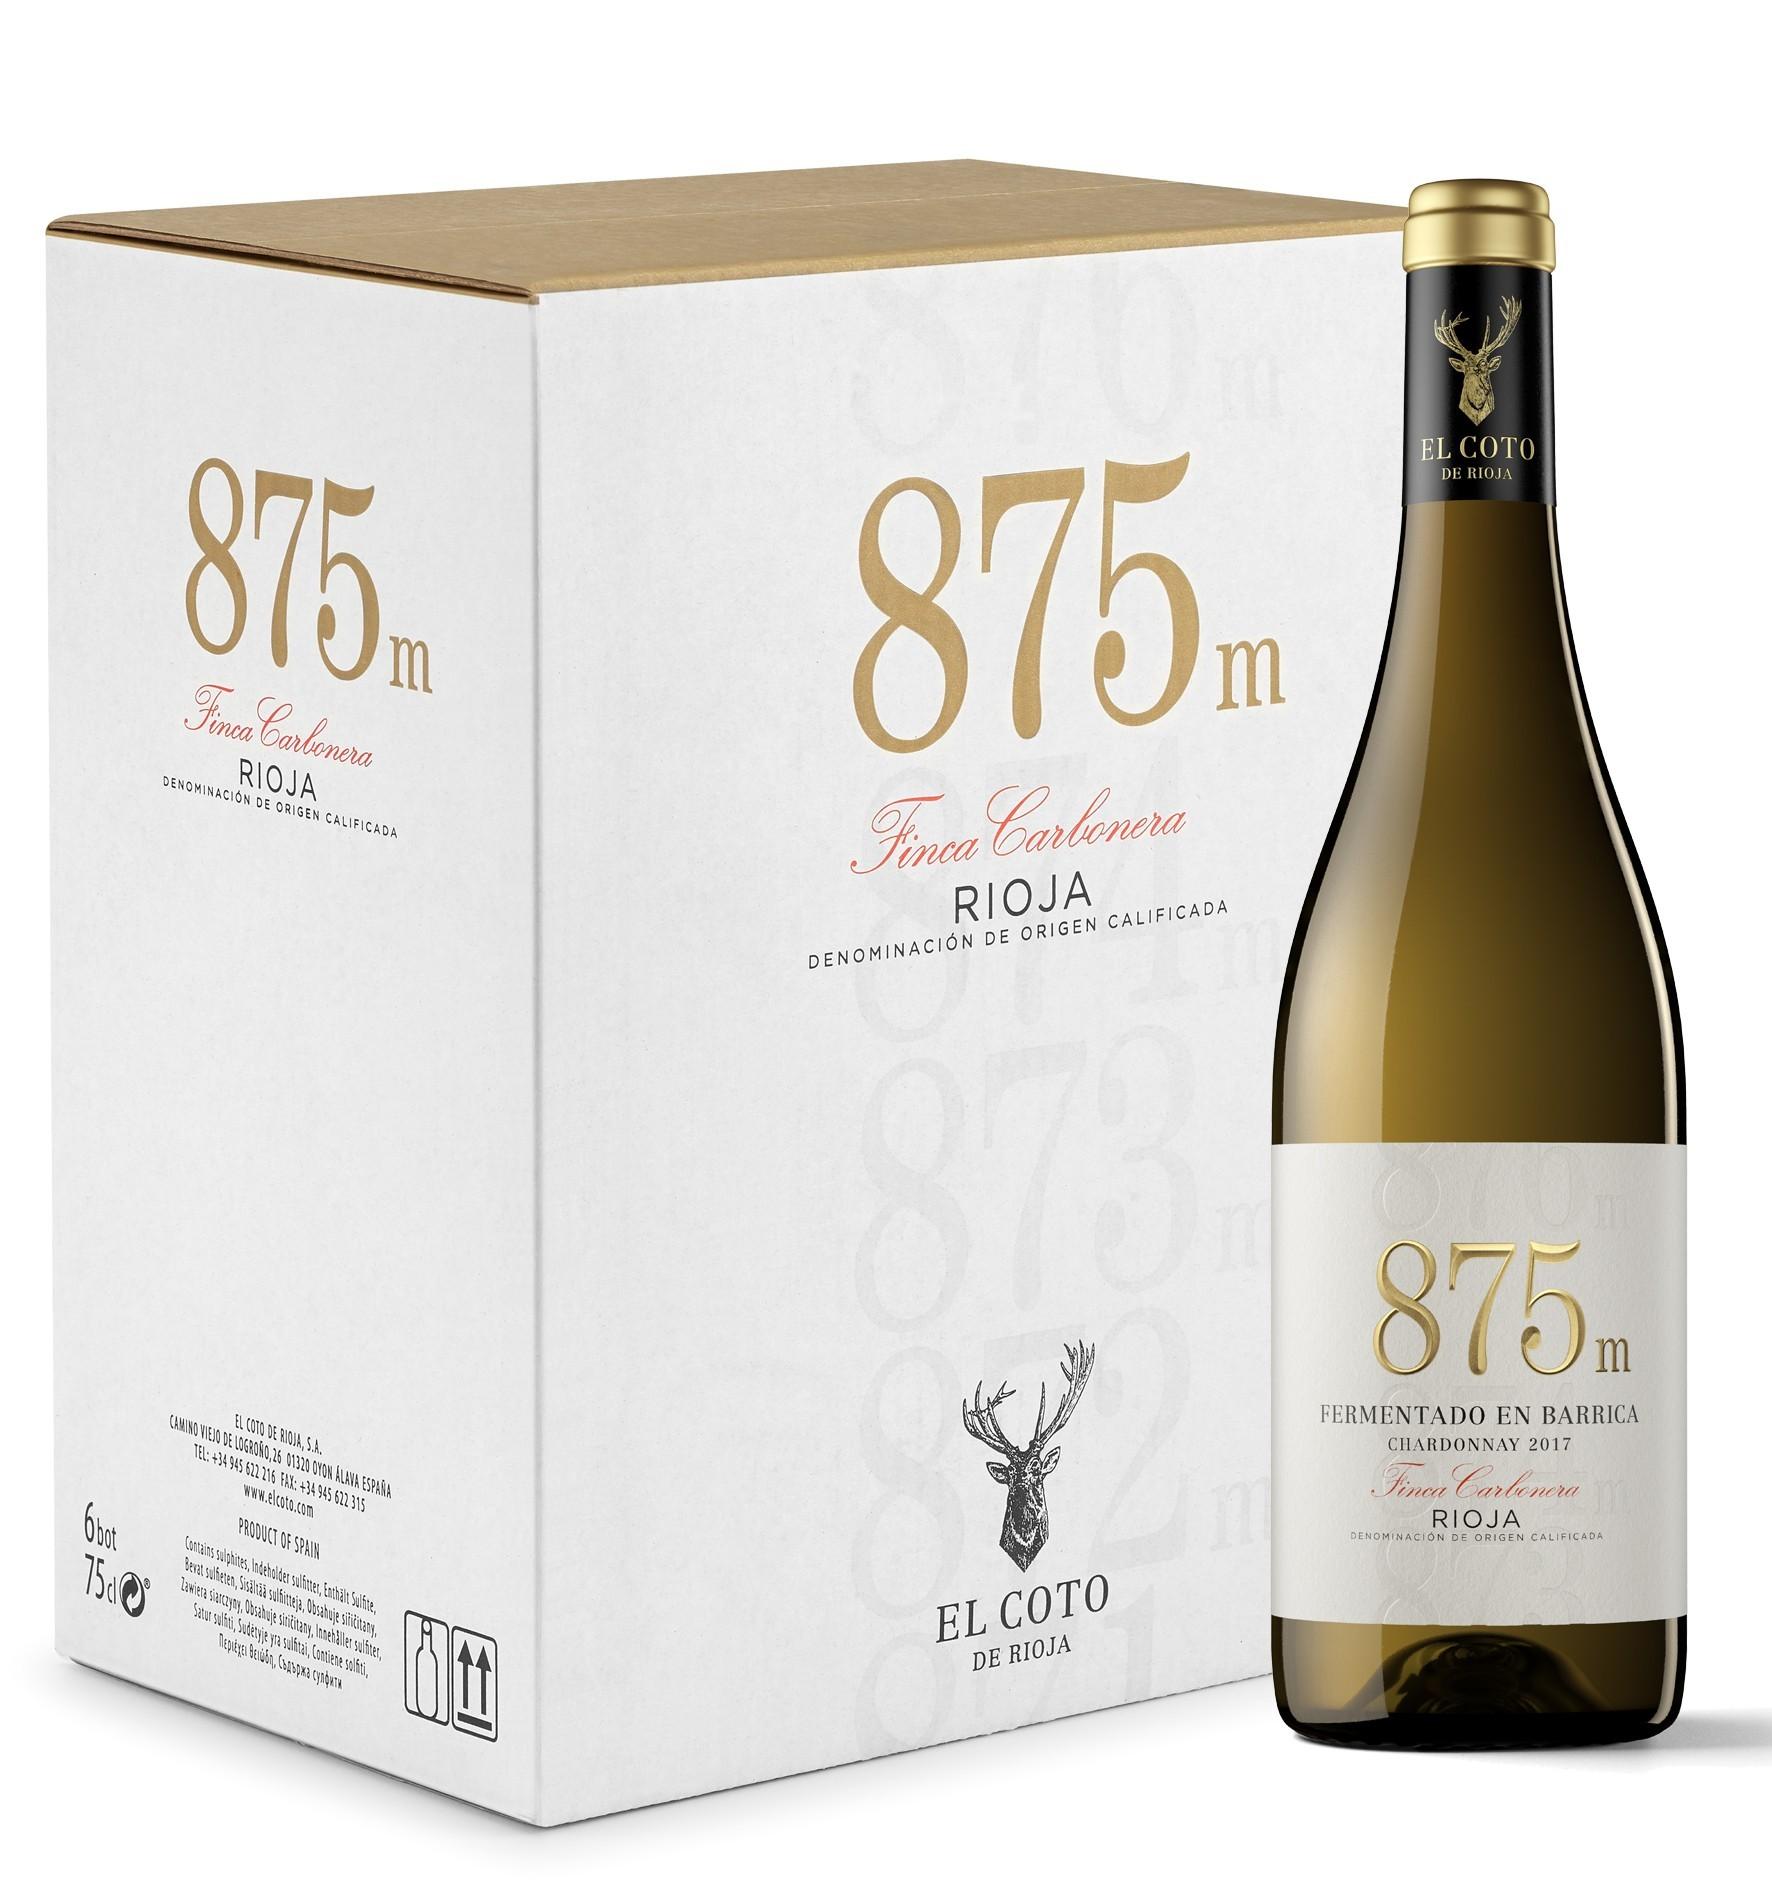 Imagen 875 m Chardonnay